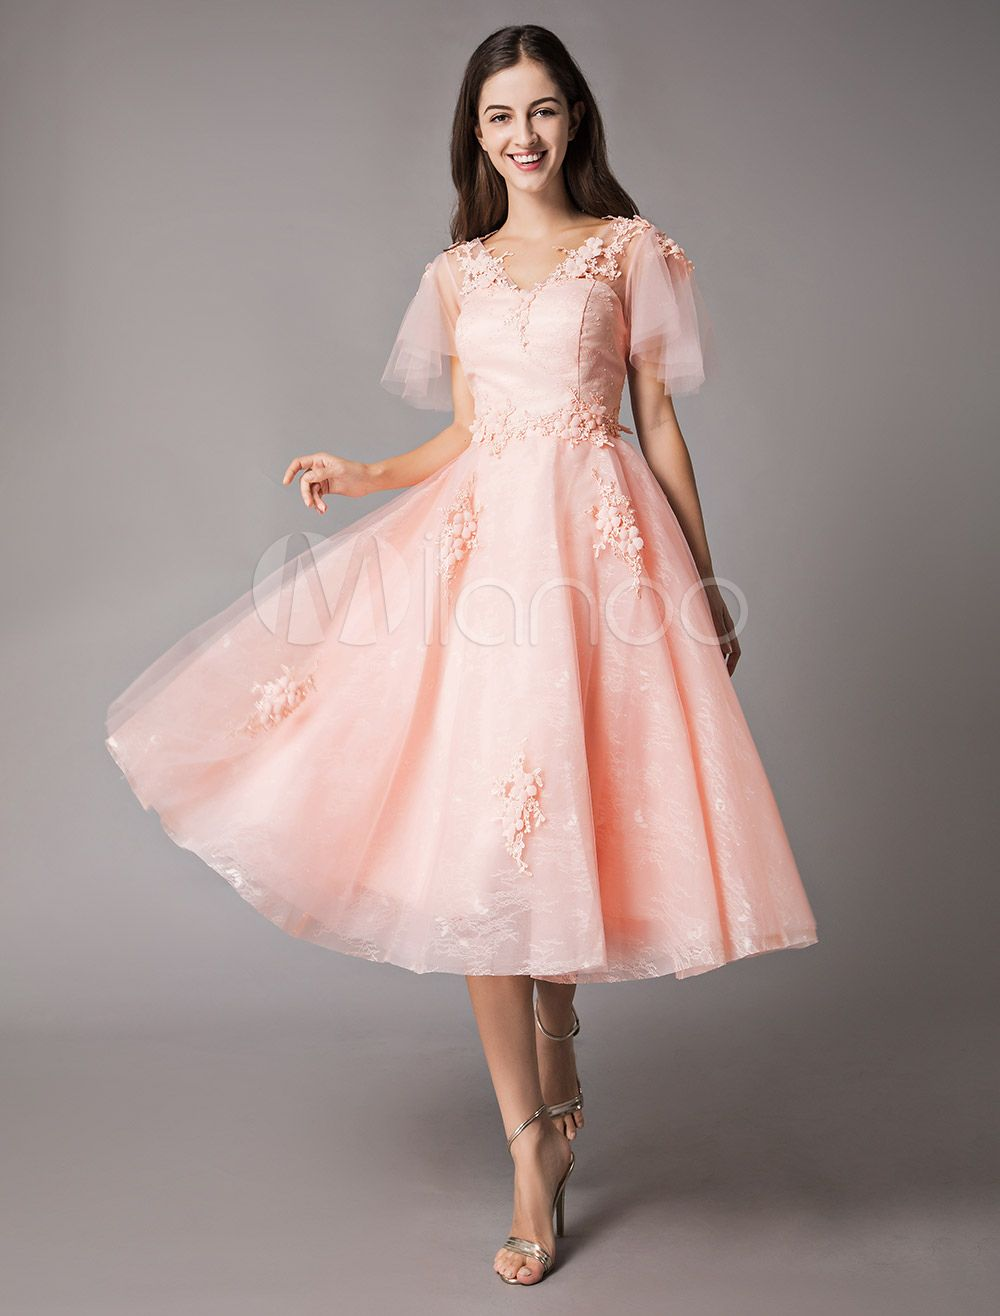 Soft Pink Prom Dresses Lace Applique V Neck Short Sleeve Graduation